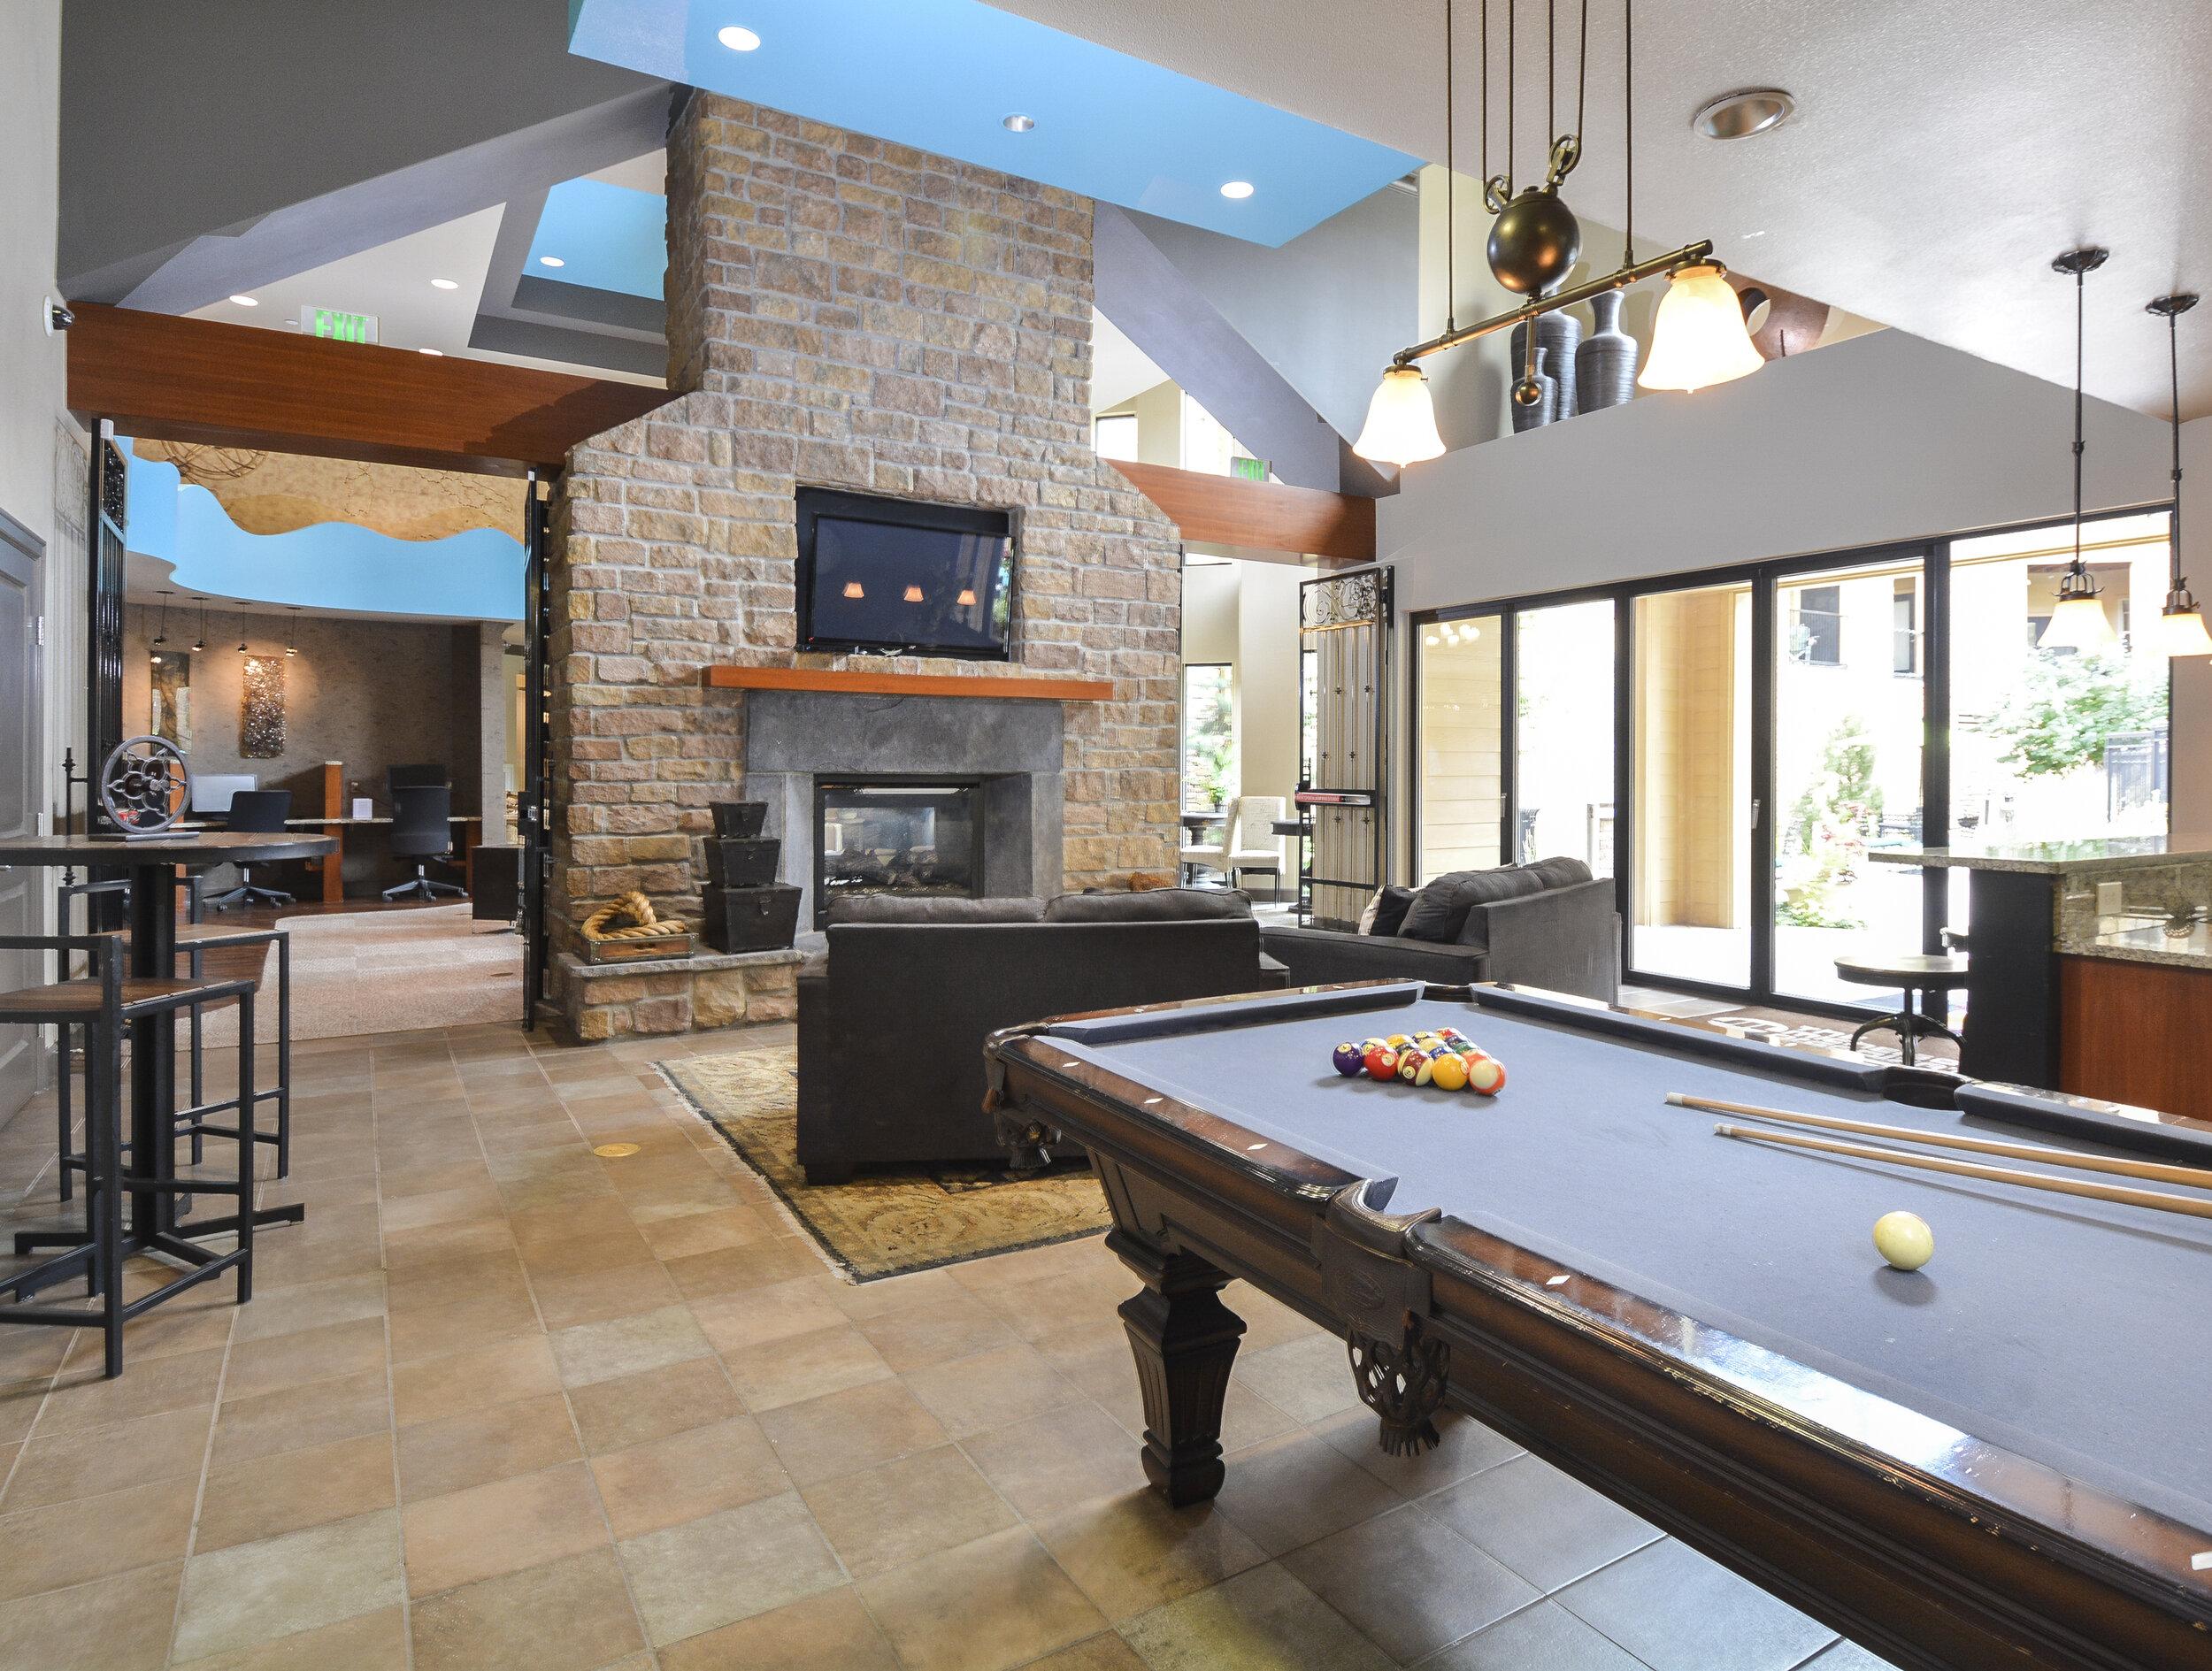 19-Clubhouse Billiards Table.jpg